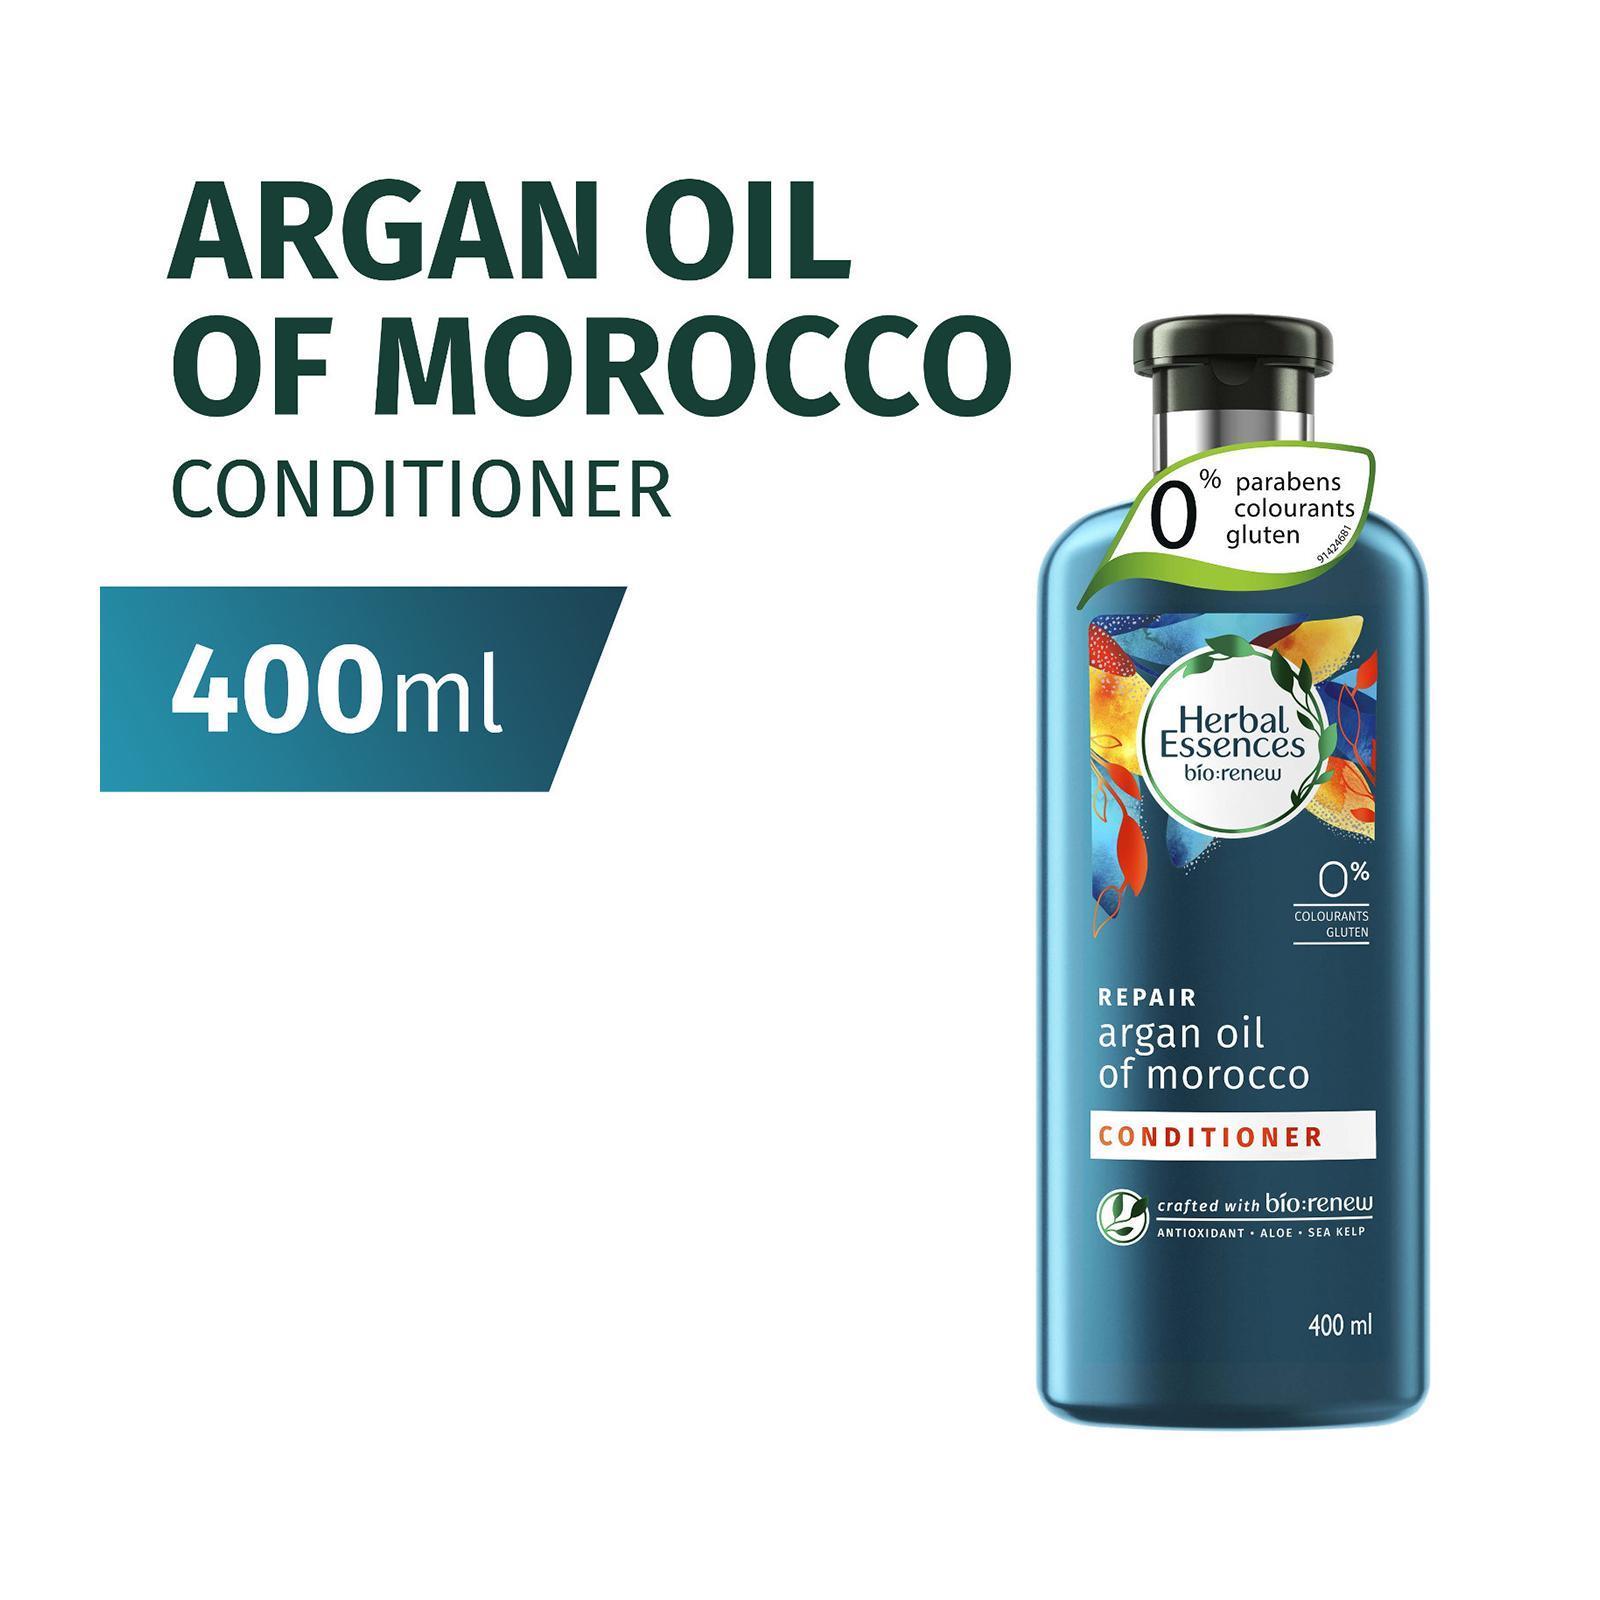 HERBAL ESSENCES herbal essences repair argan oil of morocco conditioner 400ml